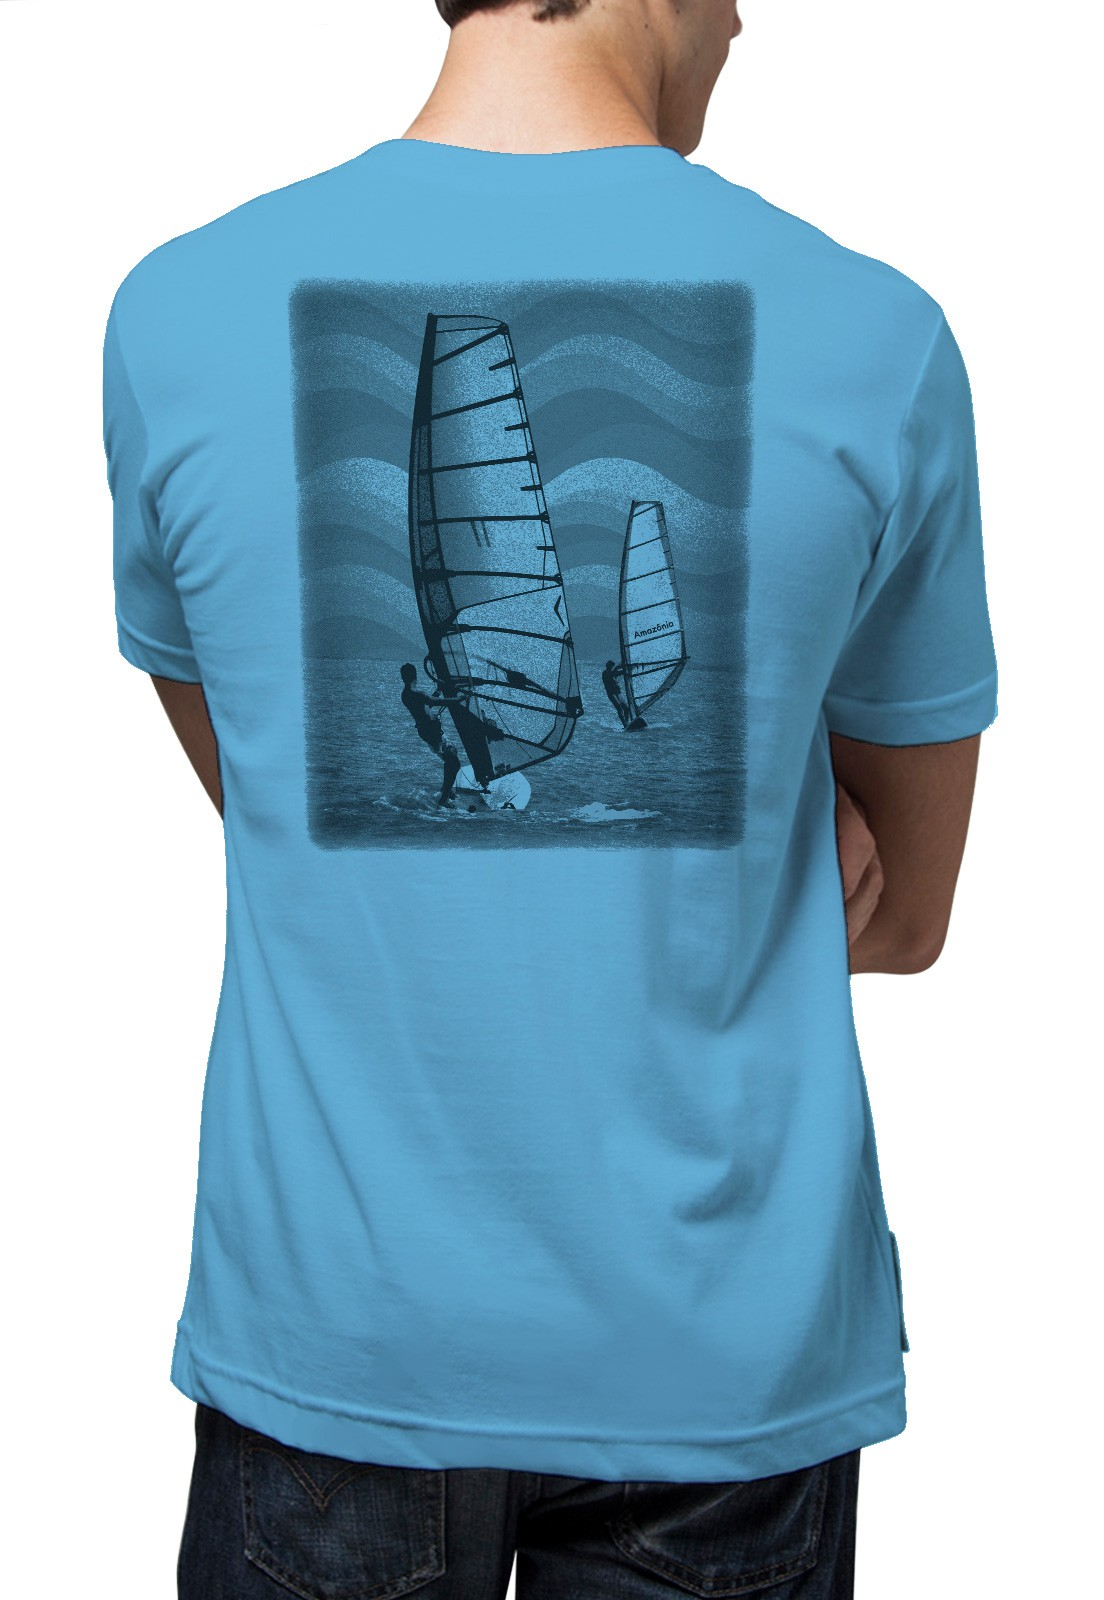 Camiseta Amazônia Windsurf - Azul Claro